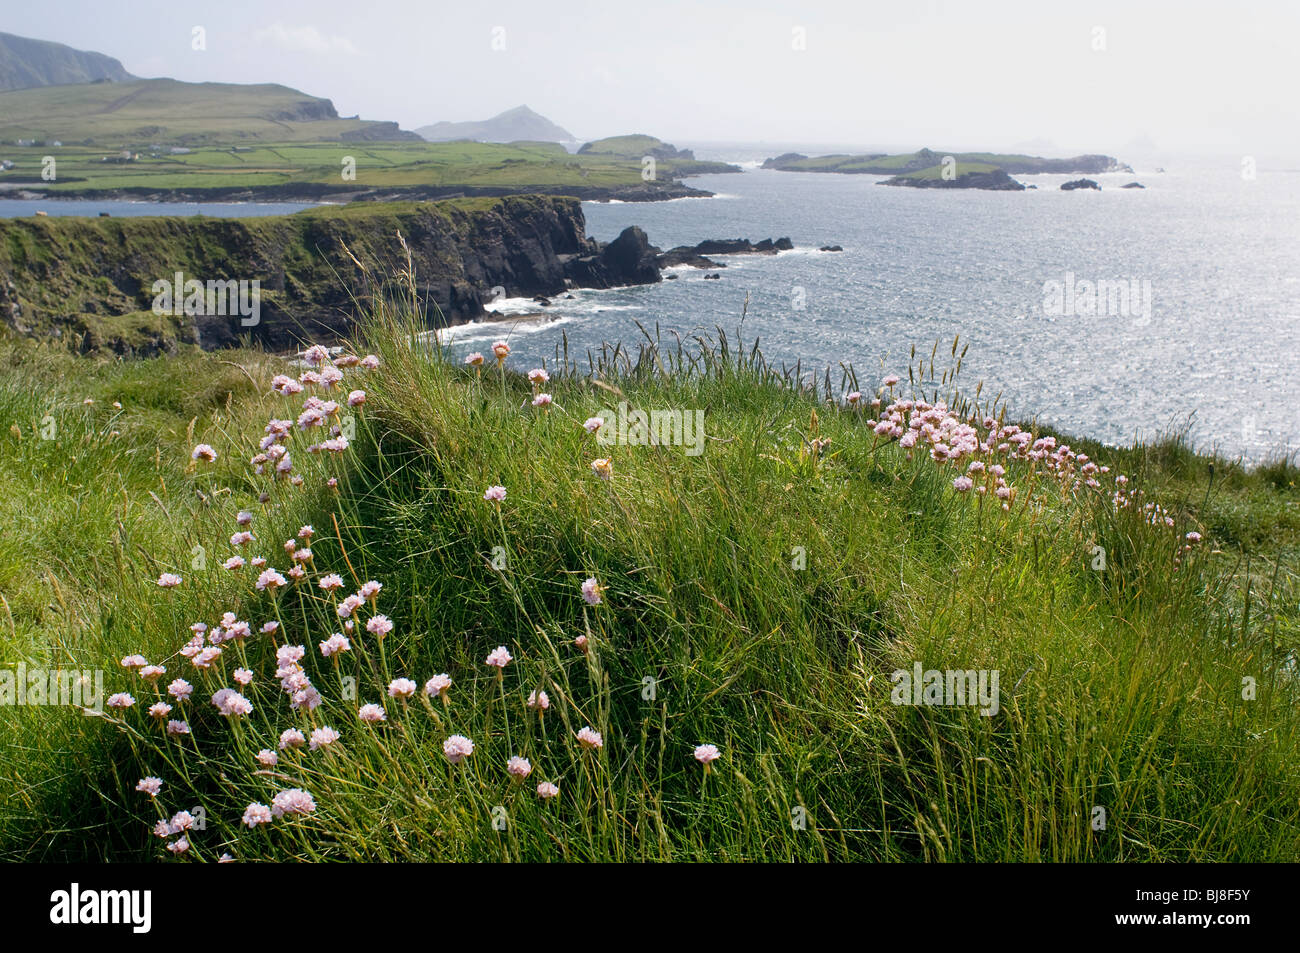 County Kerry Coast - John Gollop - Stock Image